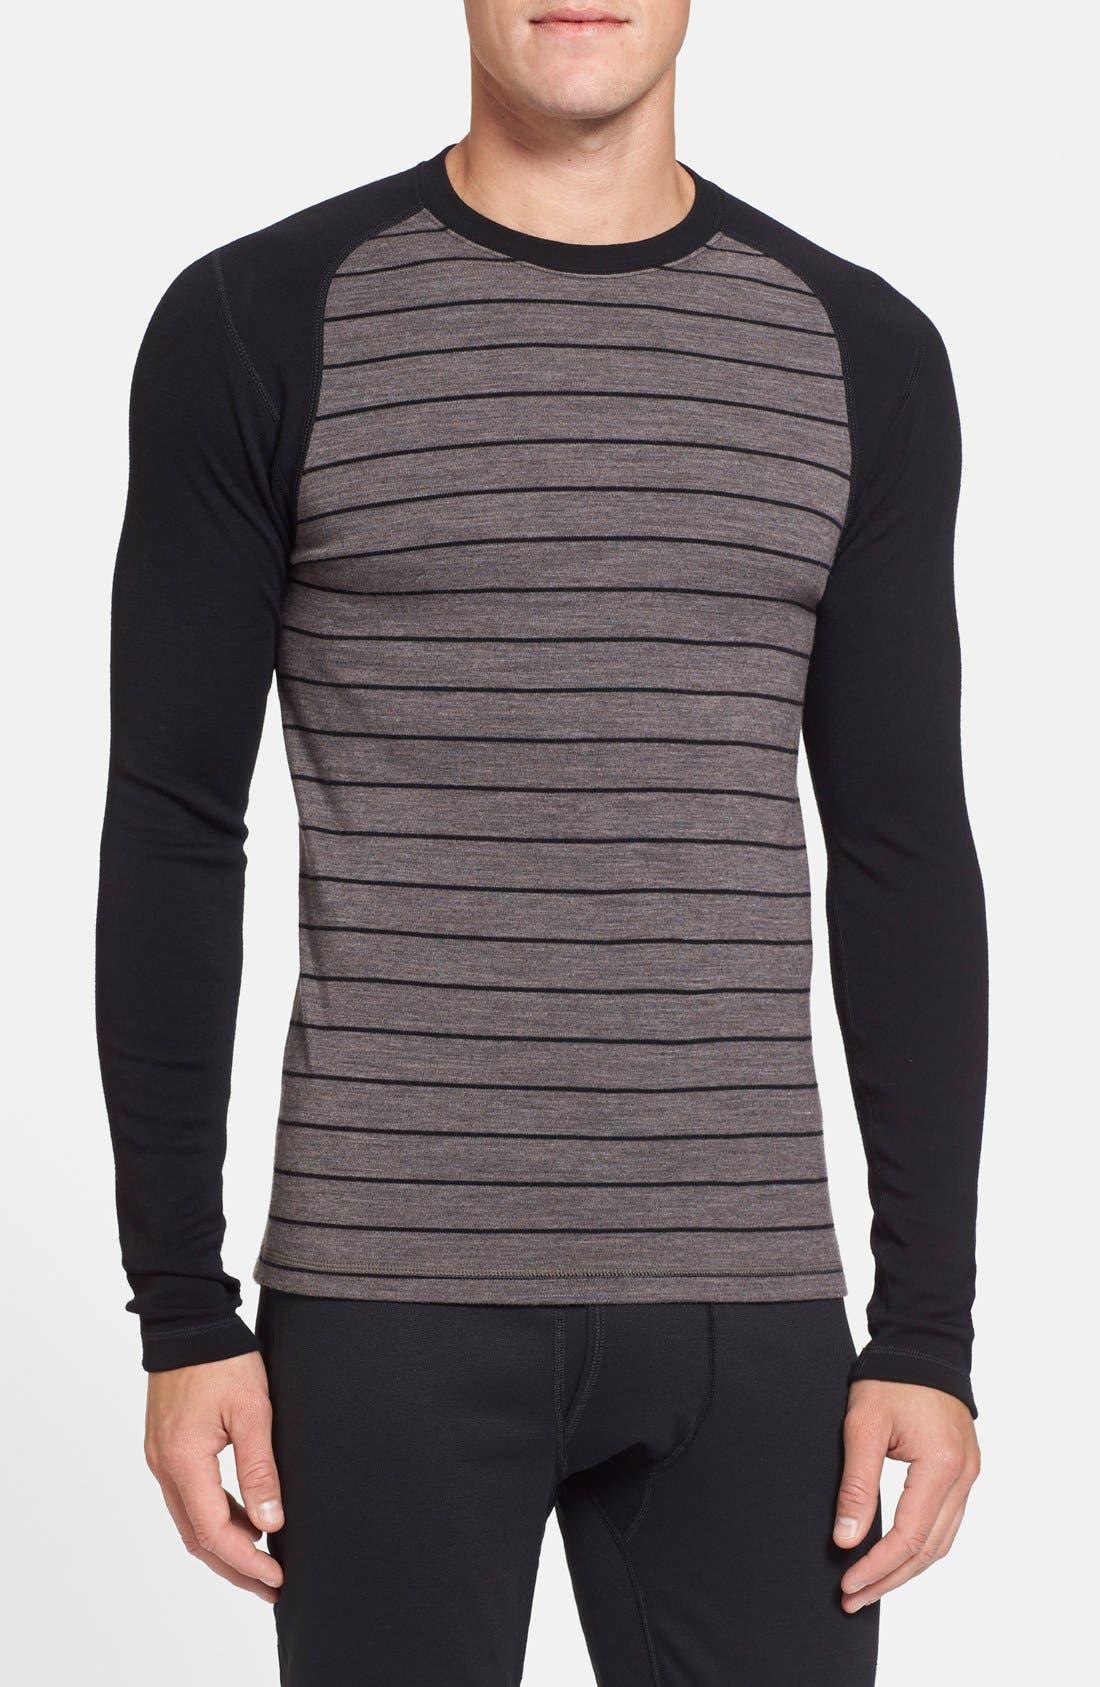 Alternate Image 1 Selected - Smartwool 250g Base Layer Midweight Crewneck Shirt